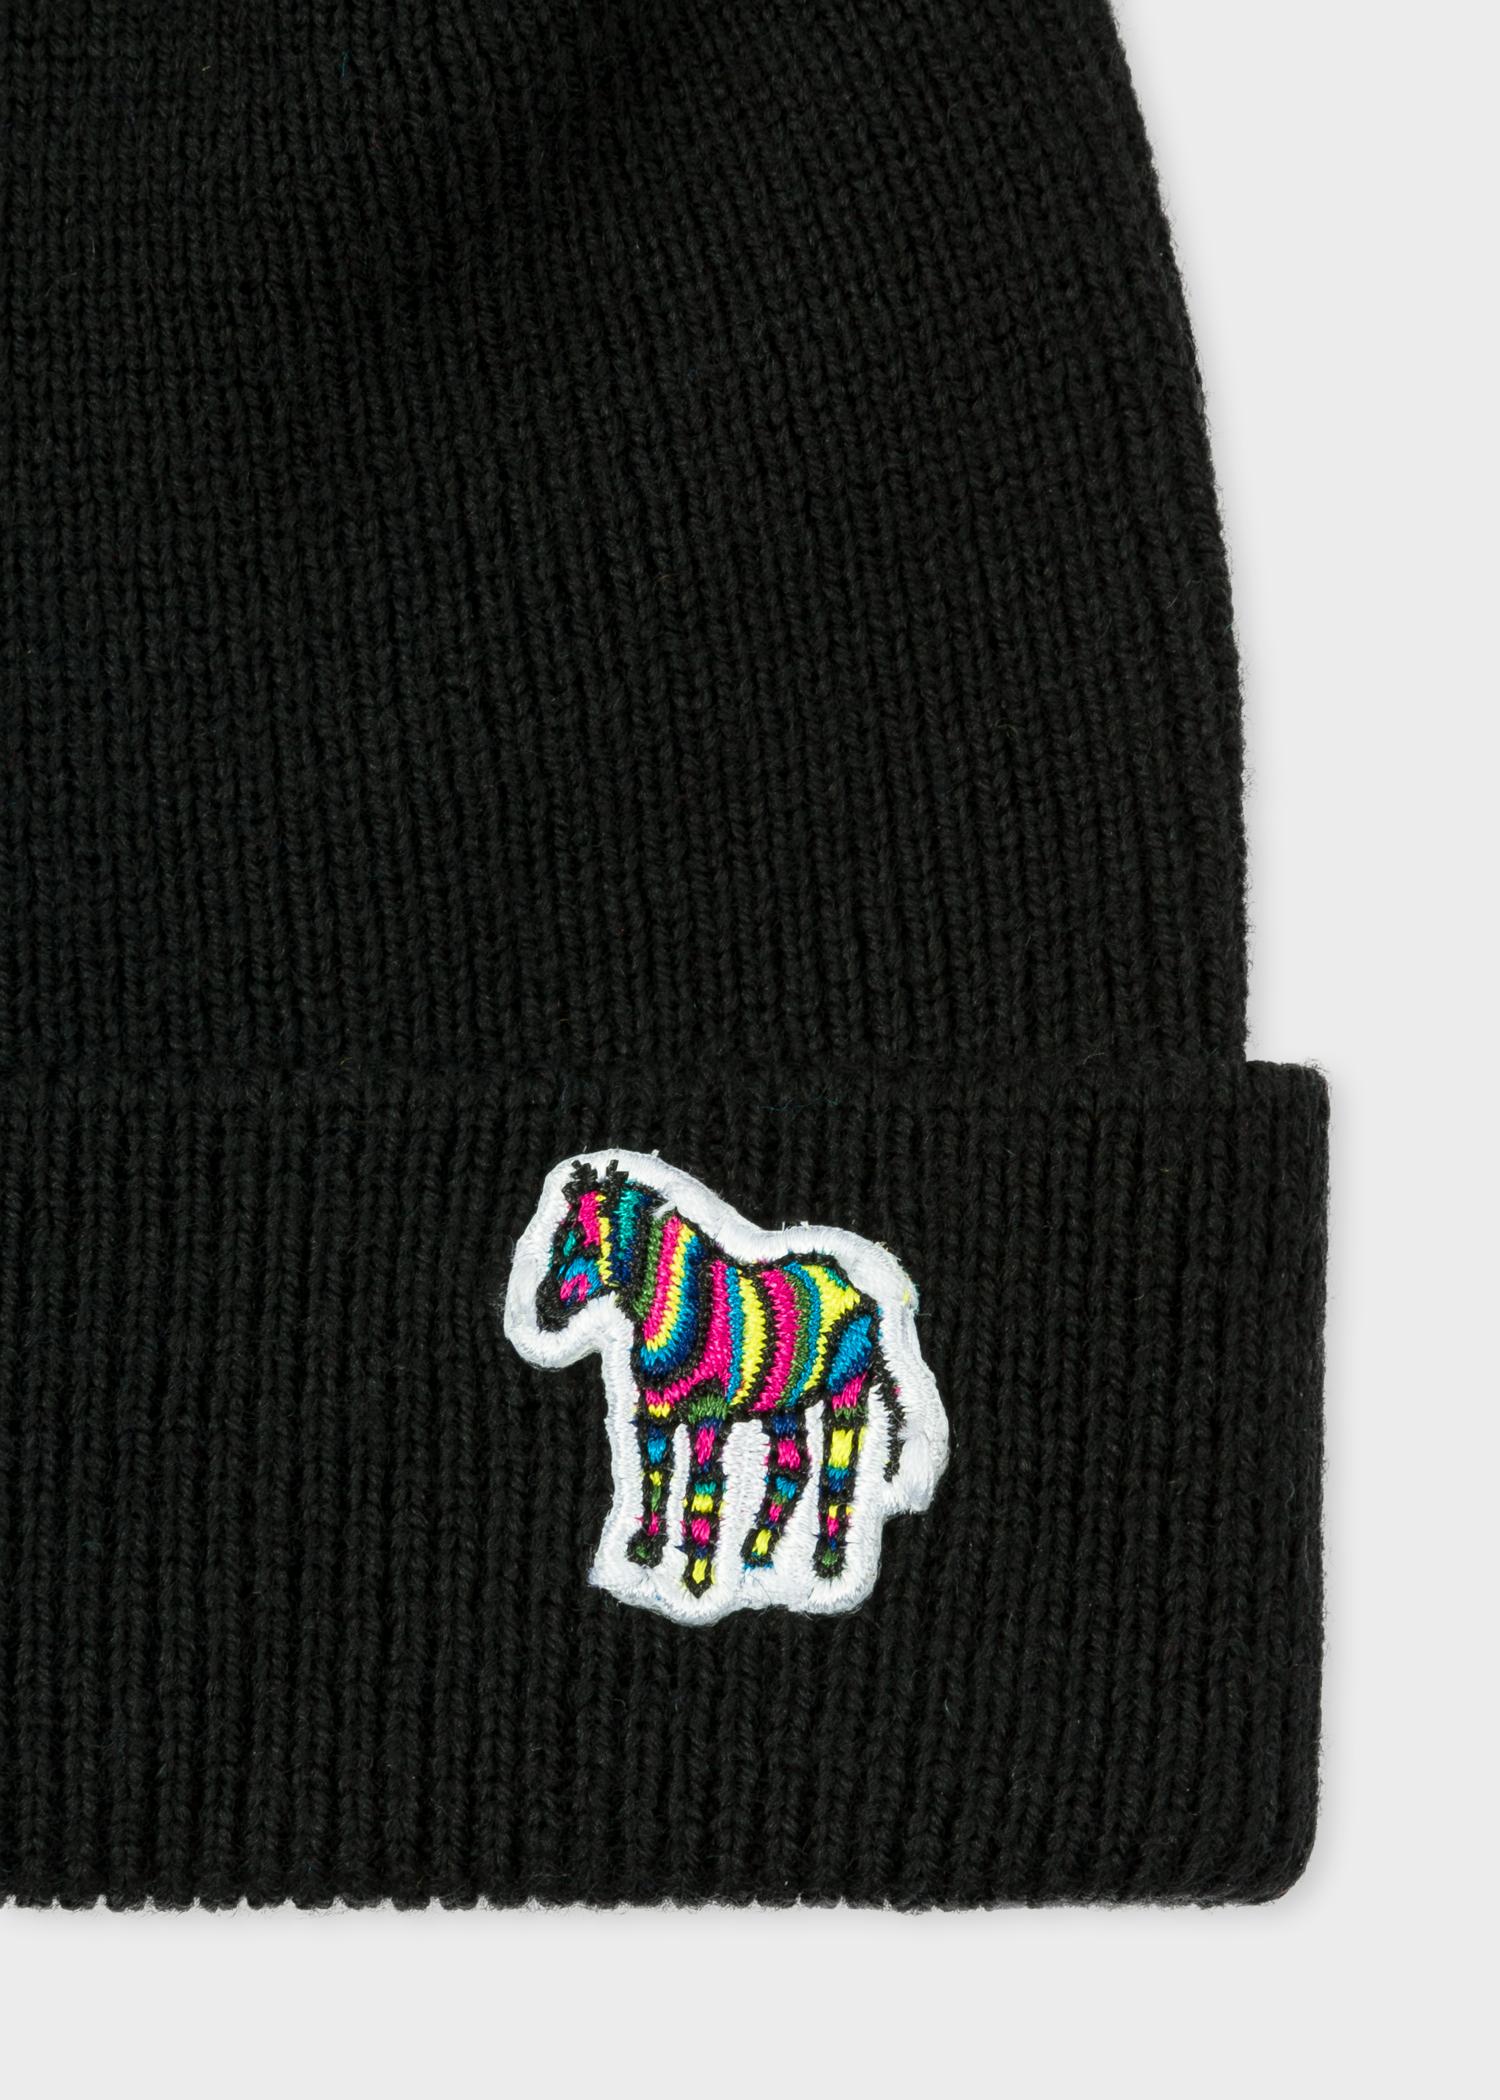 Logo detail view - Men s Black  Zebra  Logo Ribbed Lambswool Beanie Hat  Paul Smith 7565d020e978